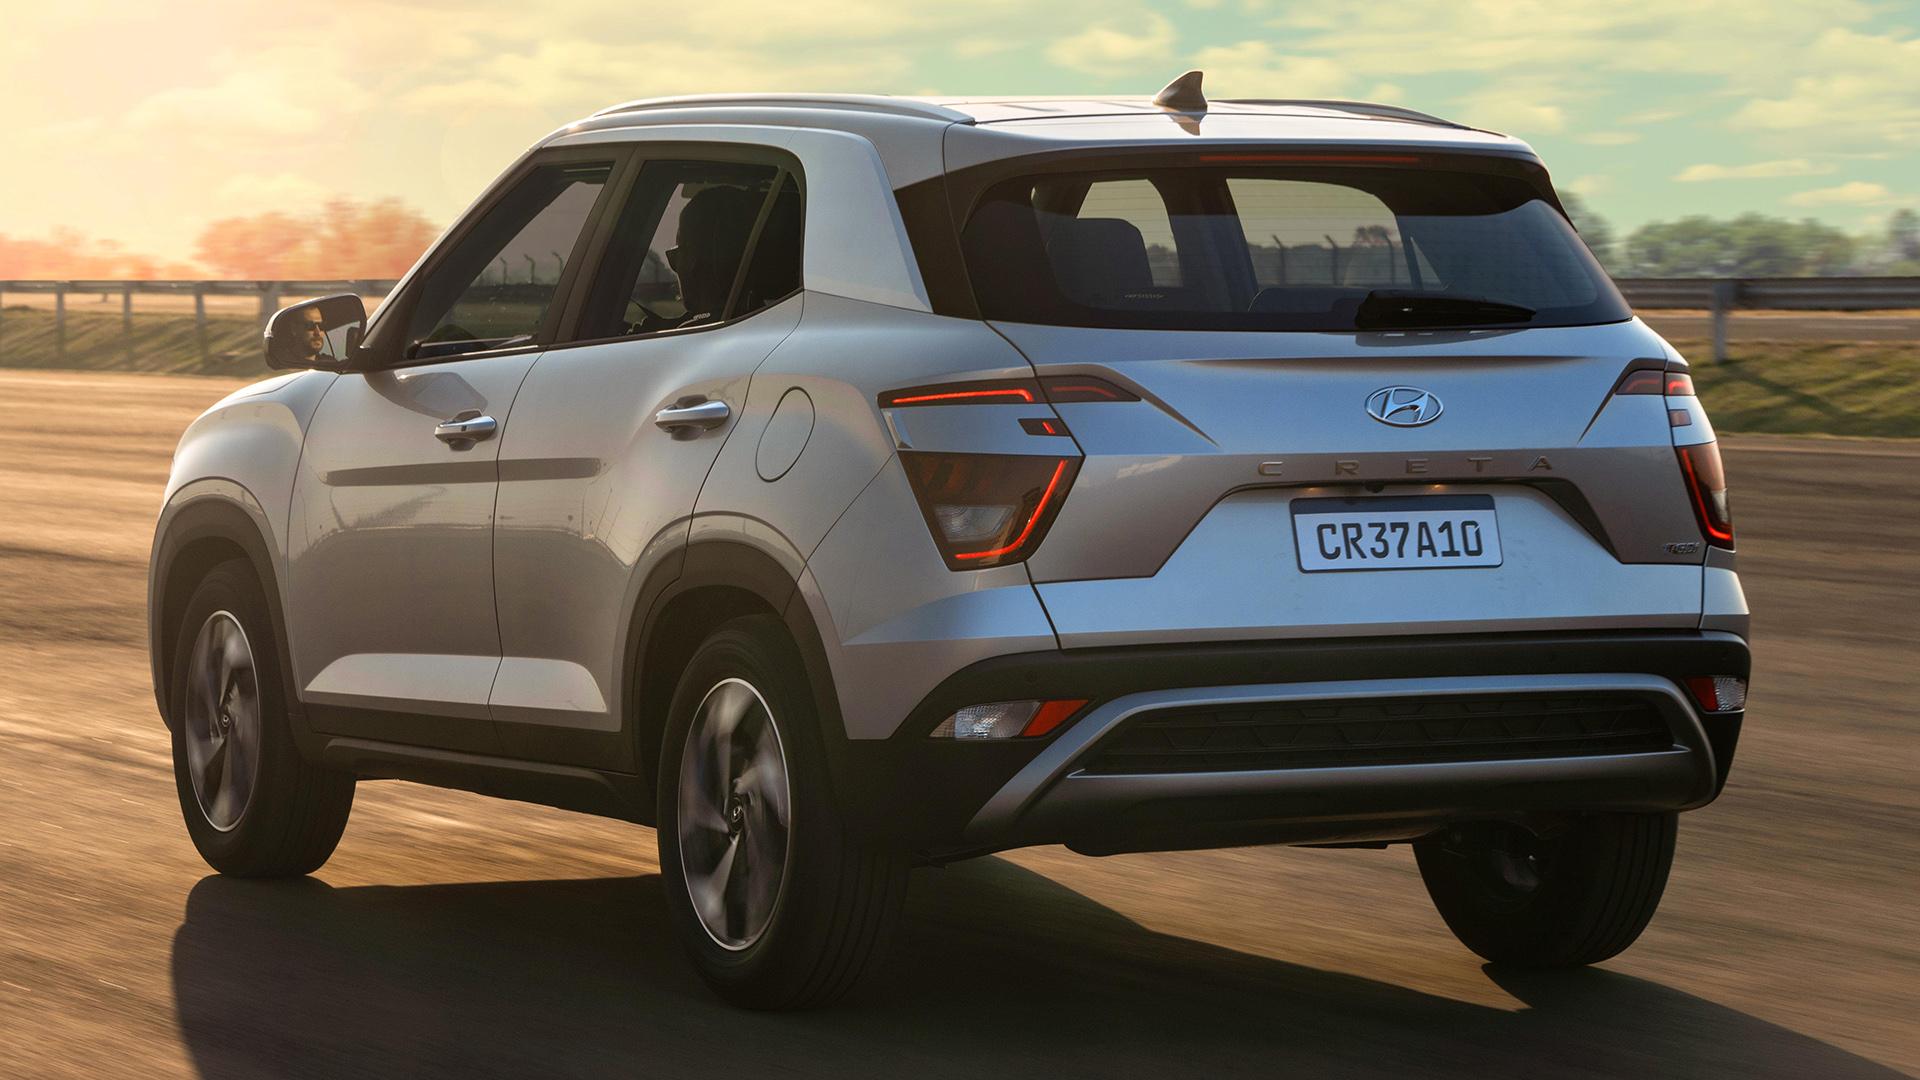 Traseira Hyundai Creta 2022